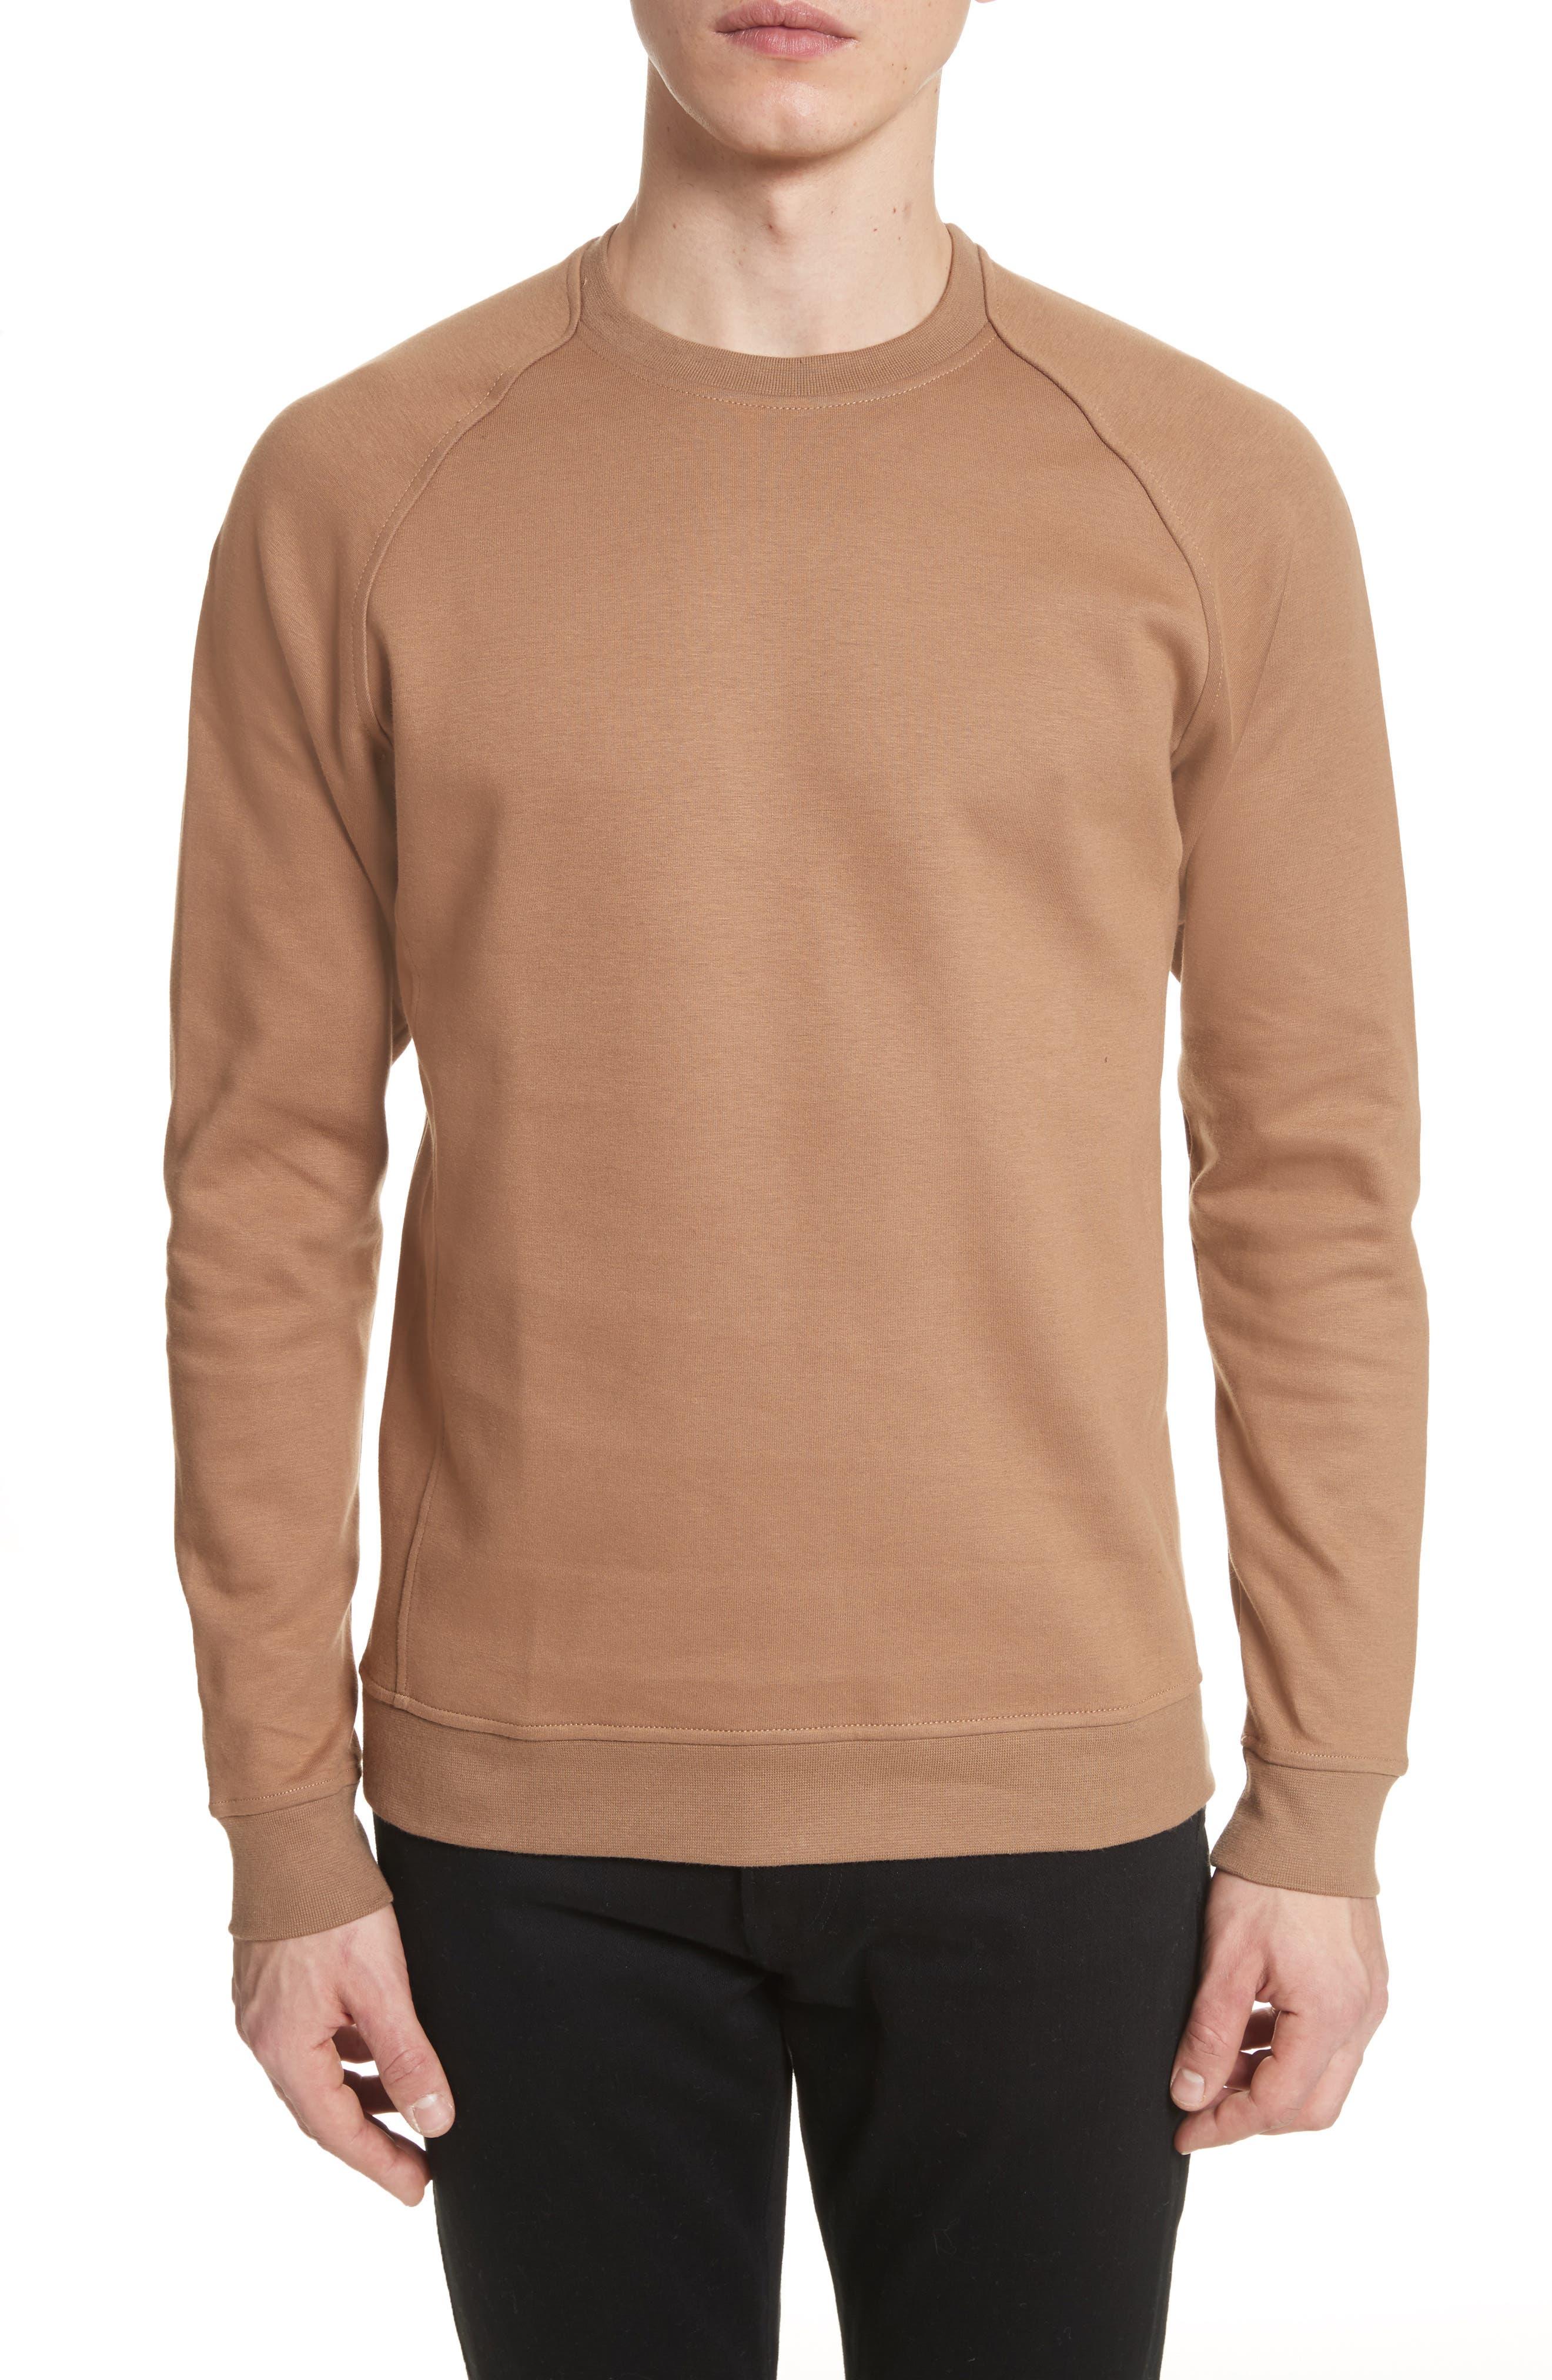 Ketel Dry Mercerized Crewneck Sweatshirt,                         Main,                         color, 251